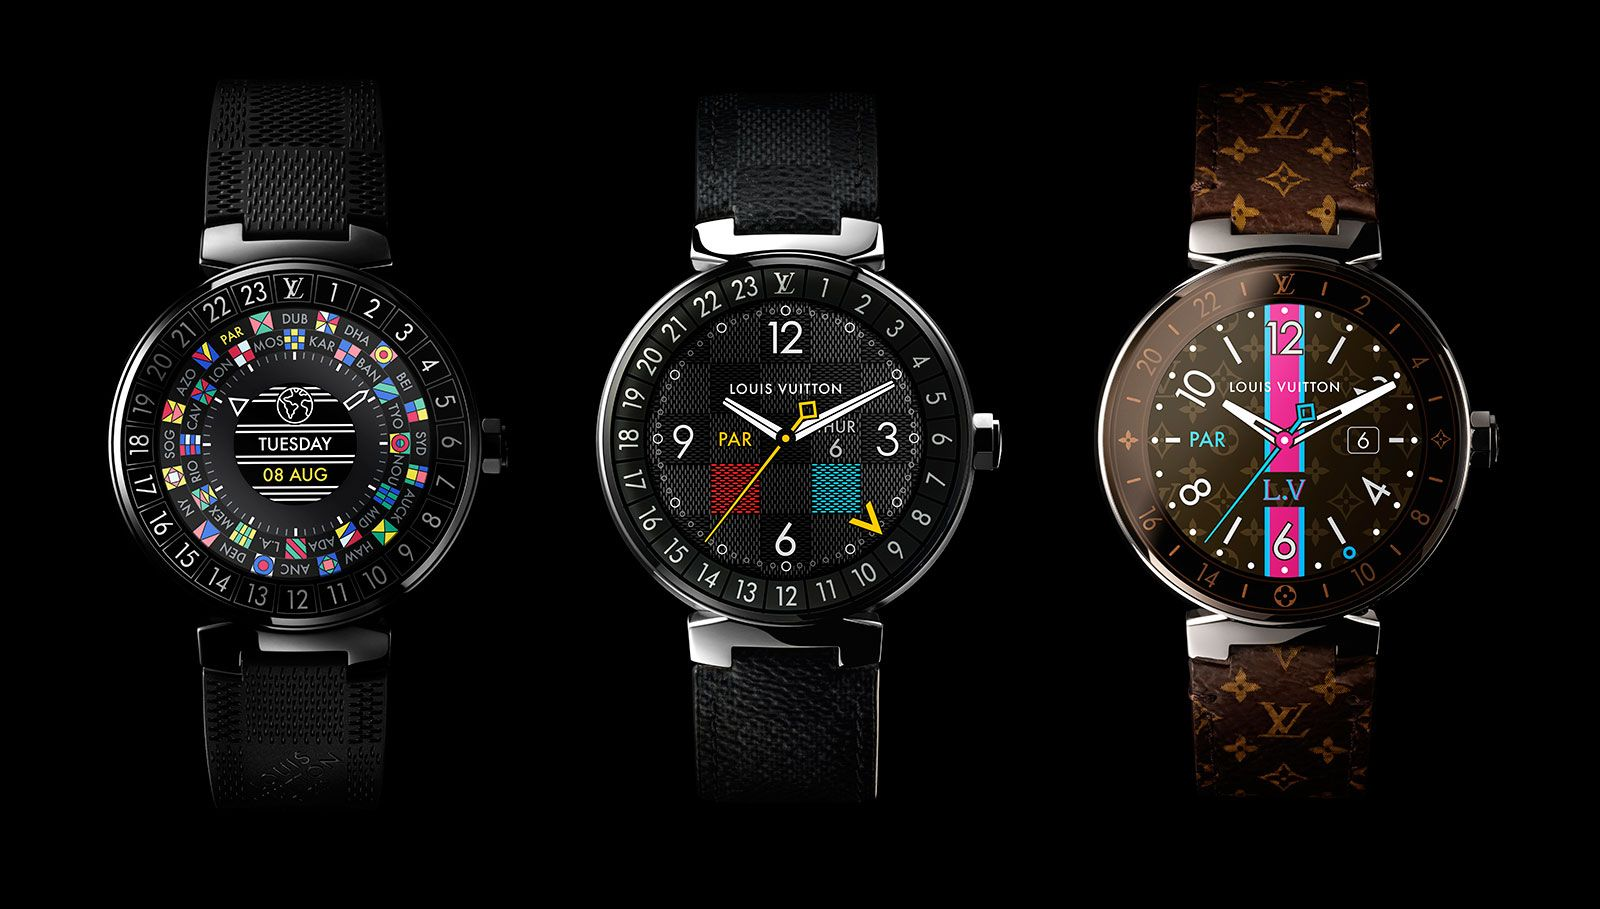 Louis Vuitton Tambour Horizon smartwatch 1